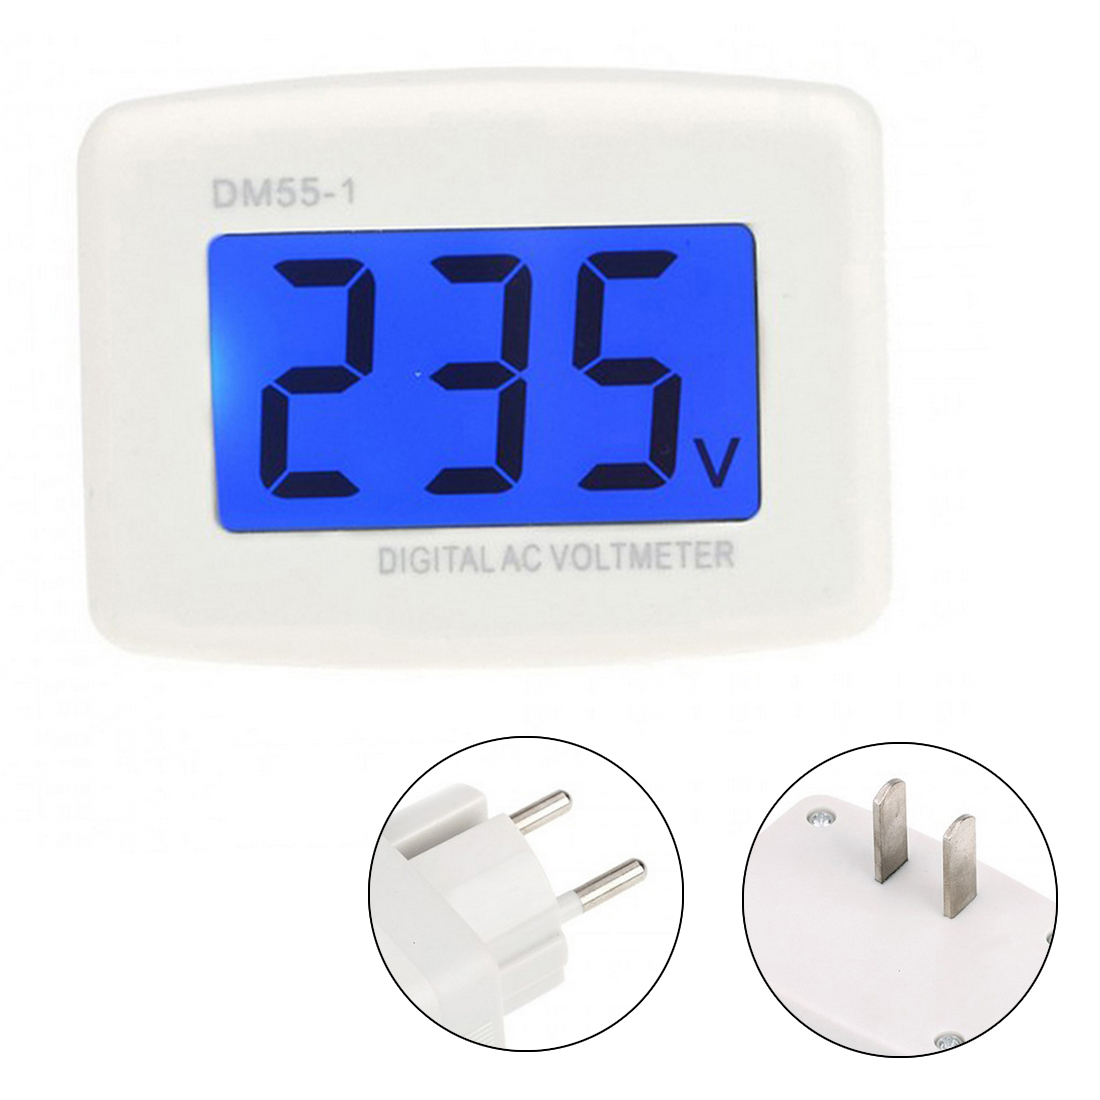 Voltage Meter Plug AC 80-300V Volt Meter LCD Digital Display Voltmeter Testers DM55-1